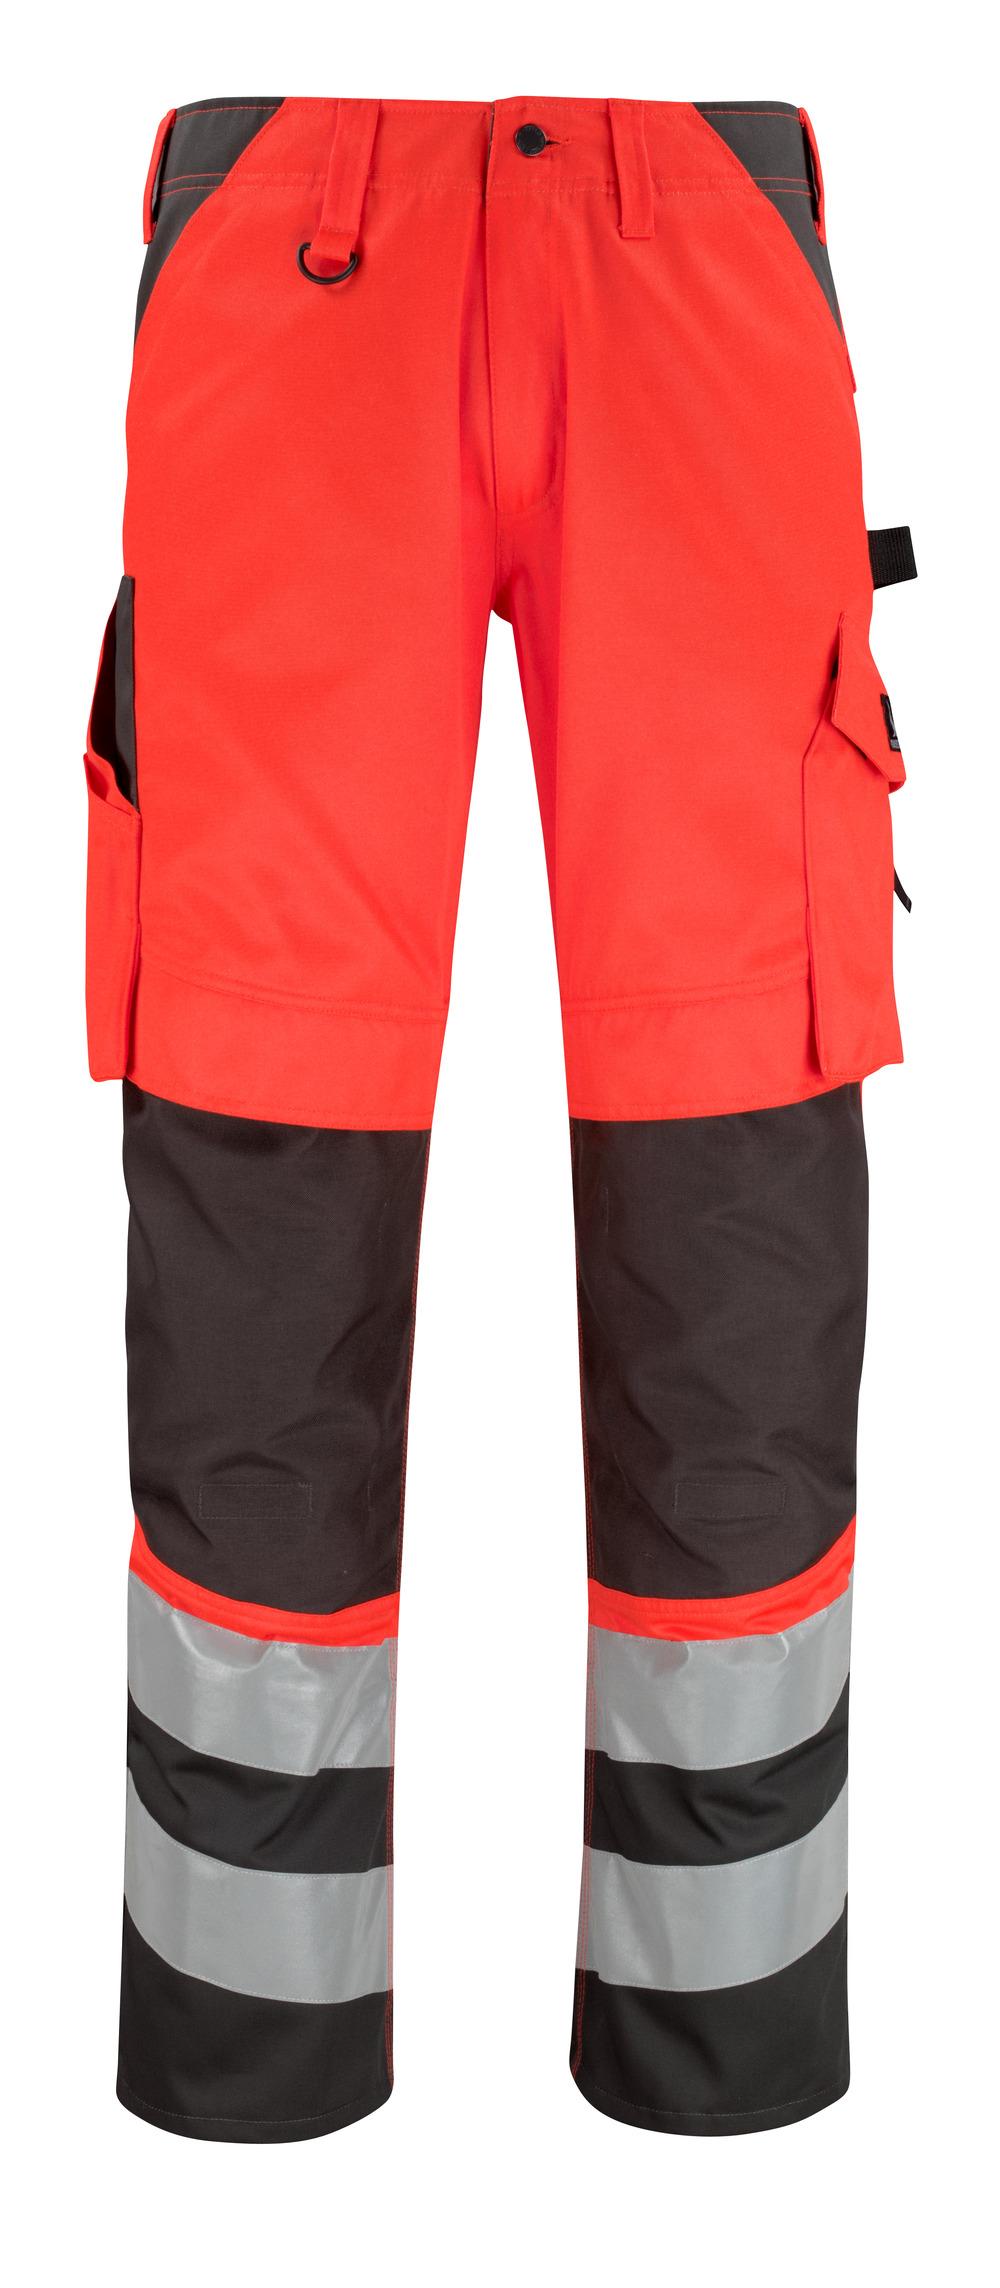 14979-860-A49 Bukser med knelommer - hi-vis rød/mørk antrasitt